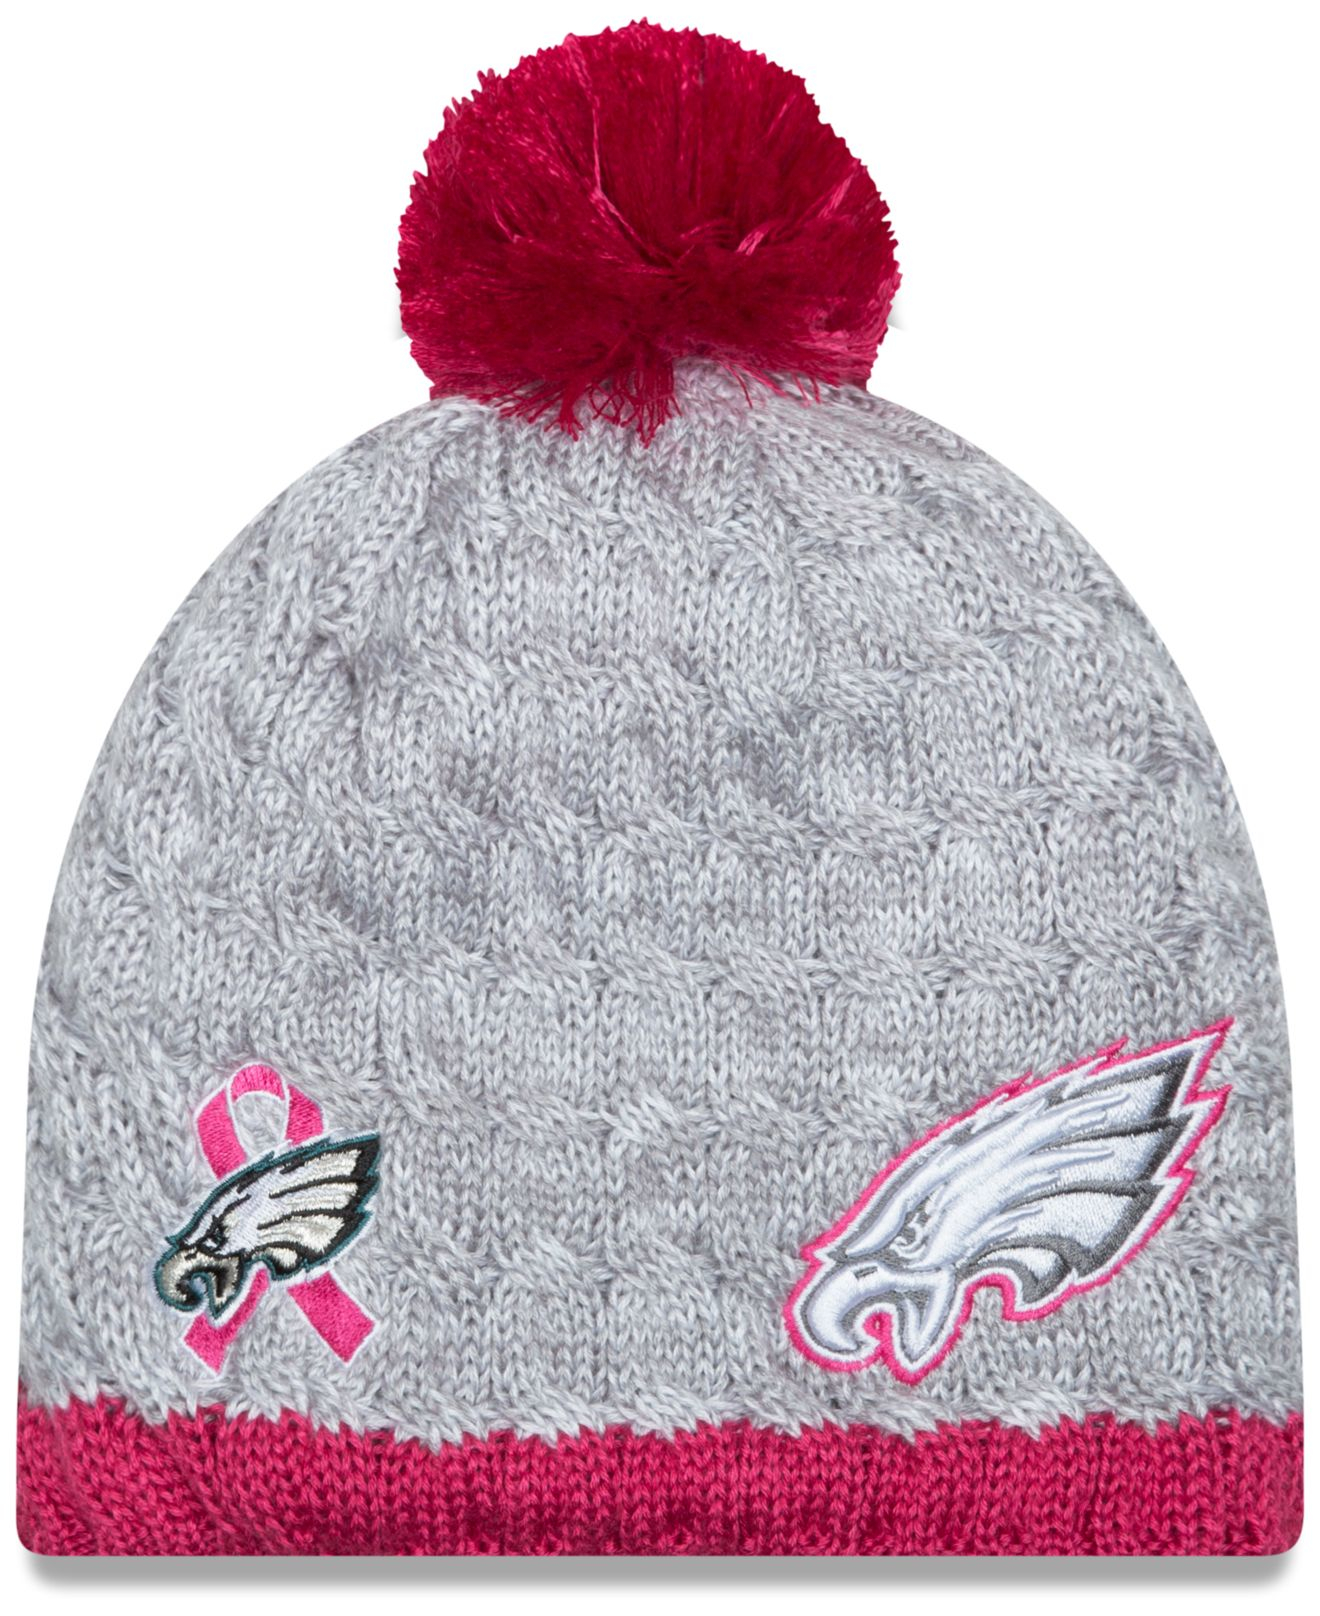 Lyst - KTZ Women s Philadelphia Eagles Breast Cancer Awareness Knit ... 82c8fdb76